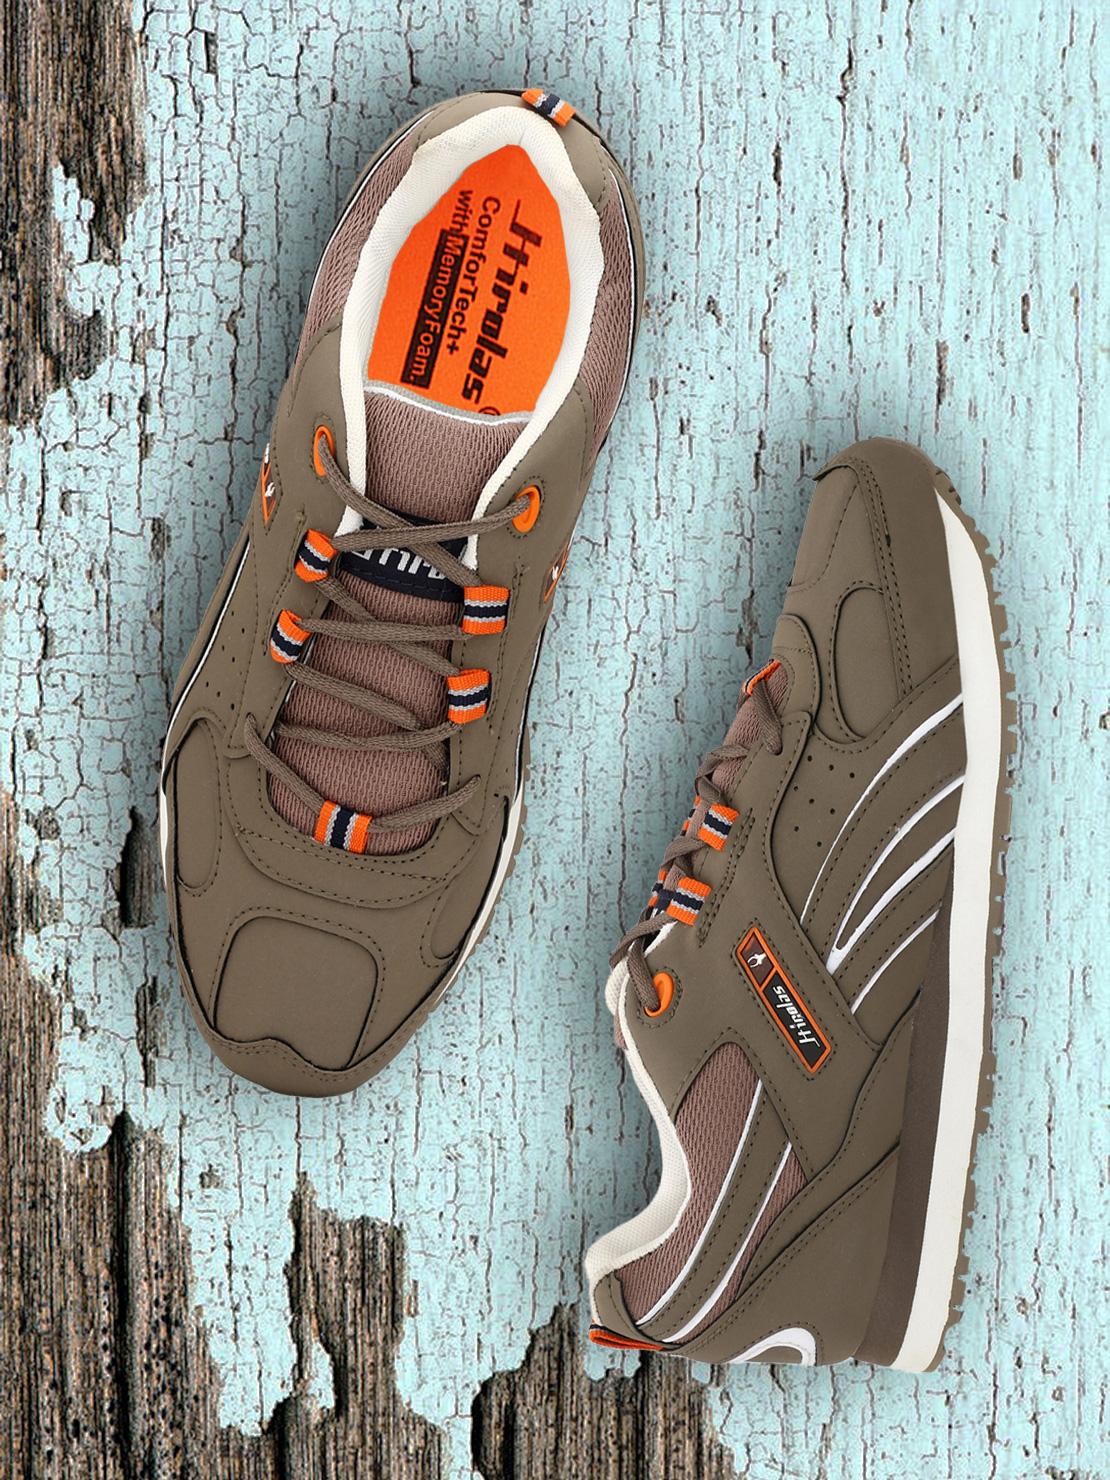 Hirolas | Hirolas Multi Sport Shock Absorbing Walking  Running Fitness Athletic Training Gym Sneaker Shoes - Chickoo